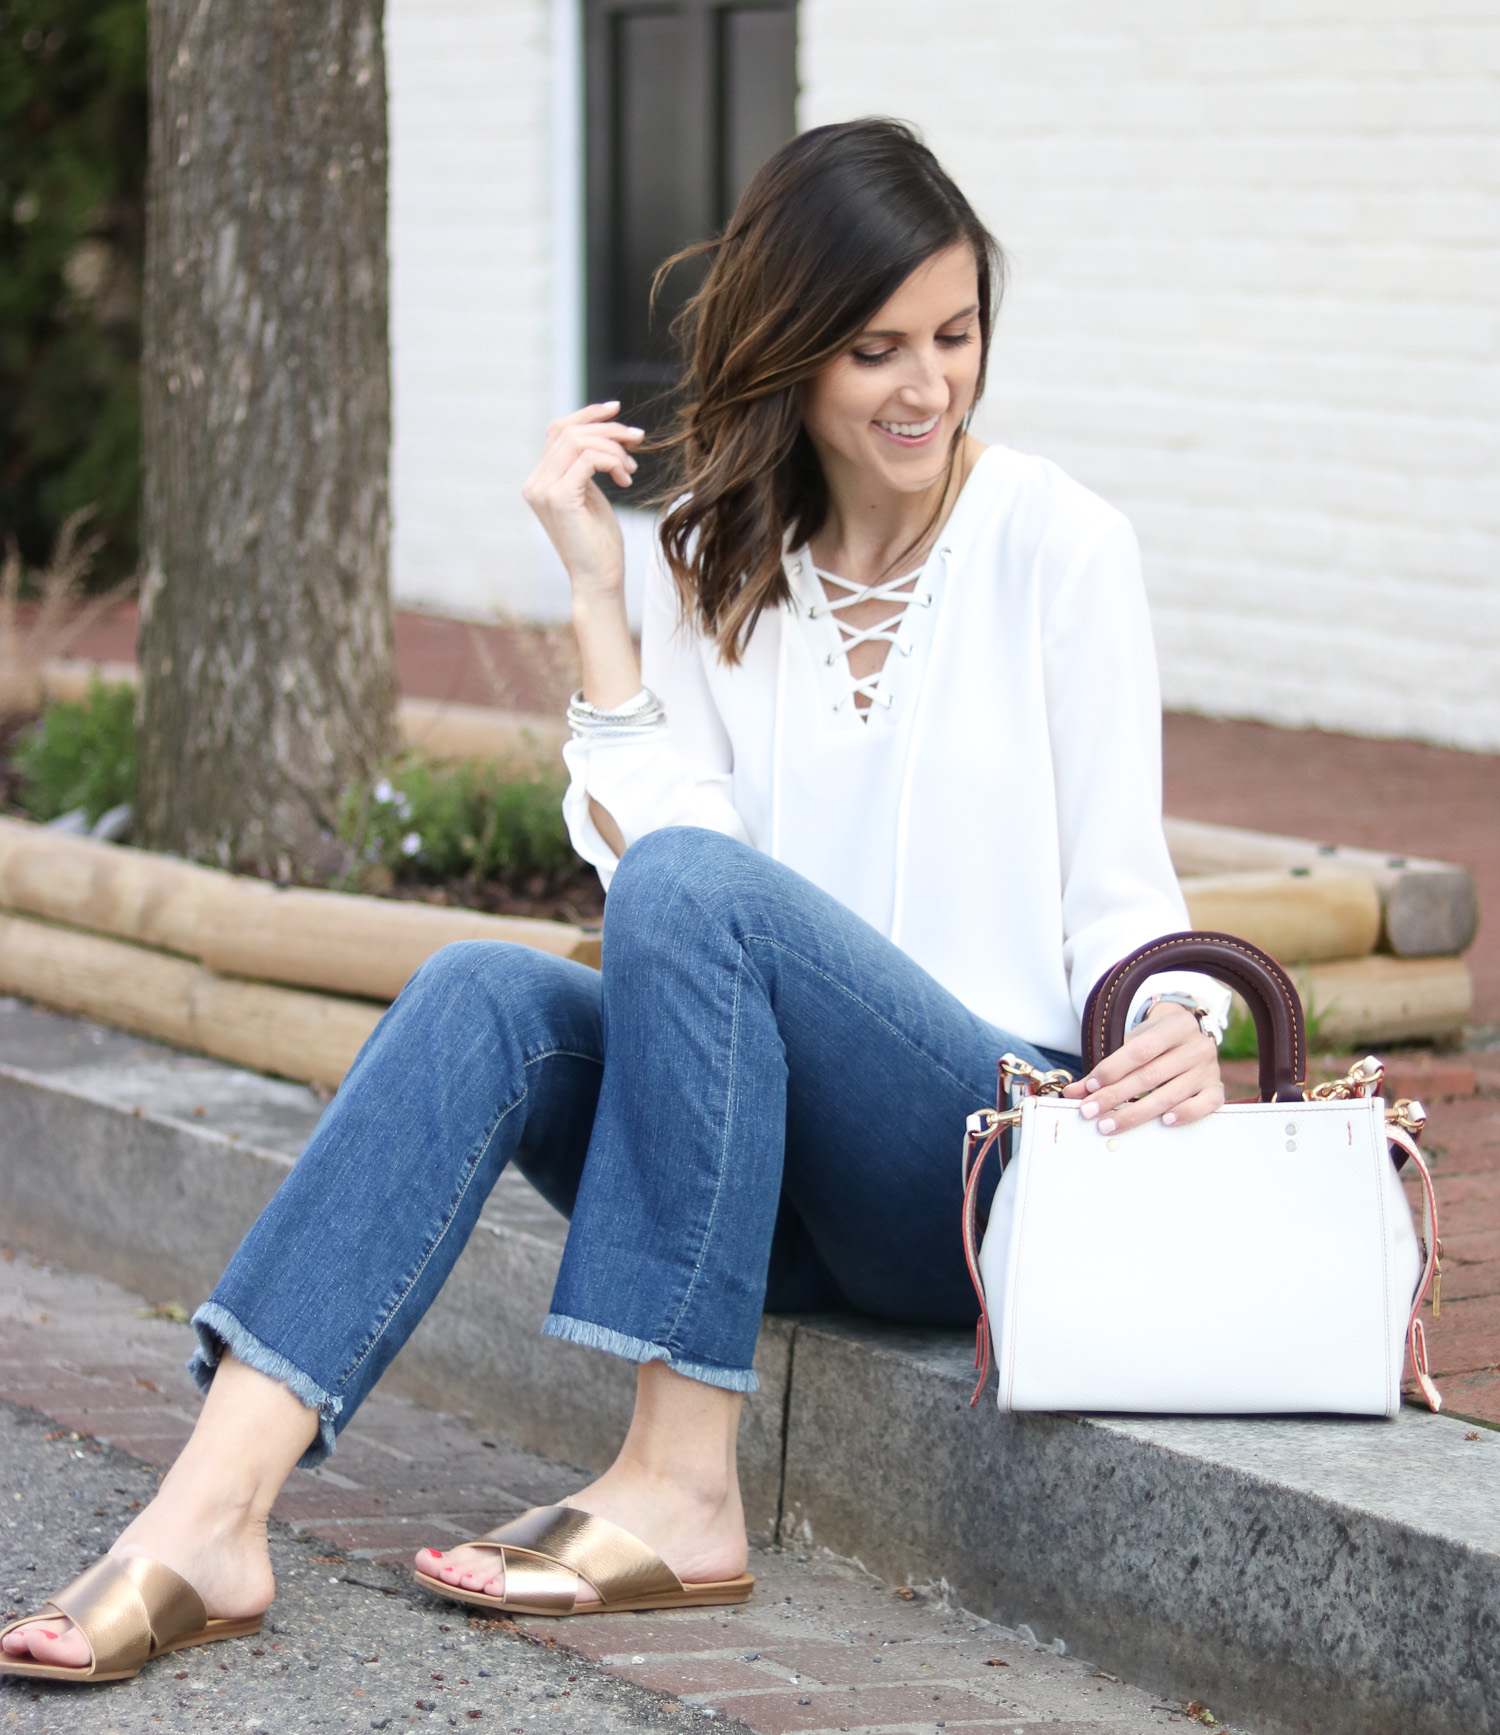 Cropped Flare Denim - Lace Up Top - Gold Slide Sandals - White Bag @cobatlchronicle